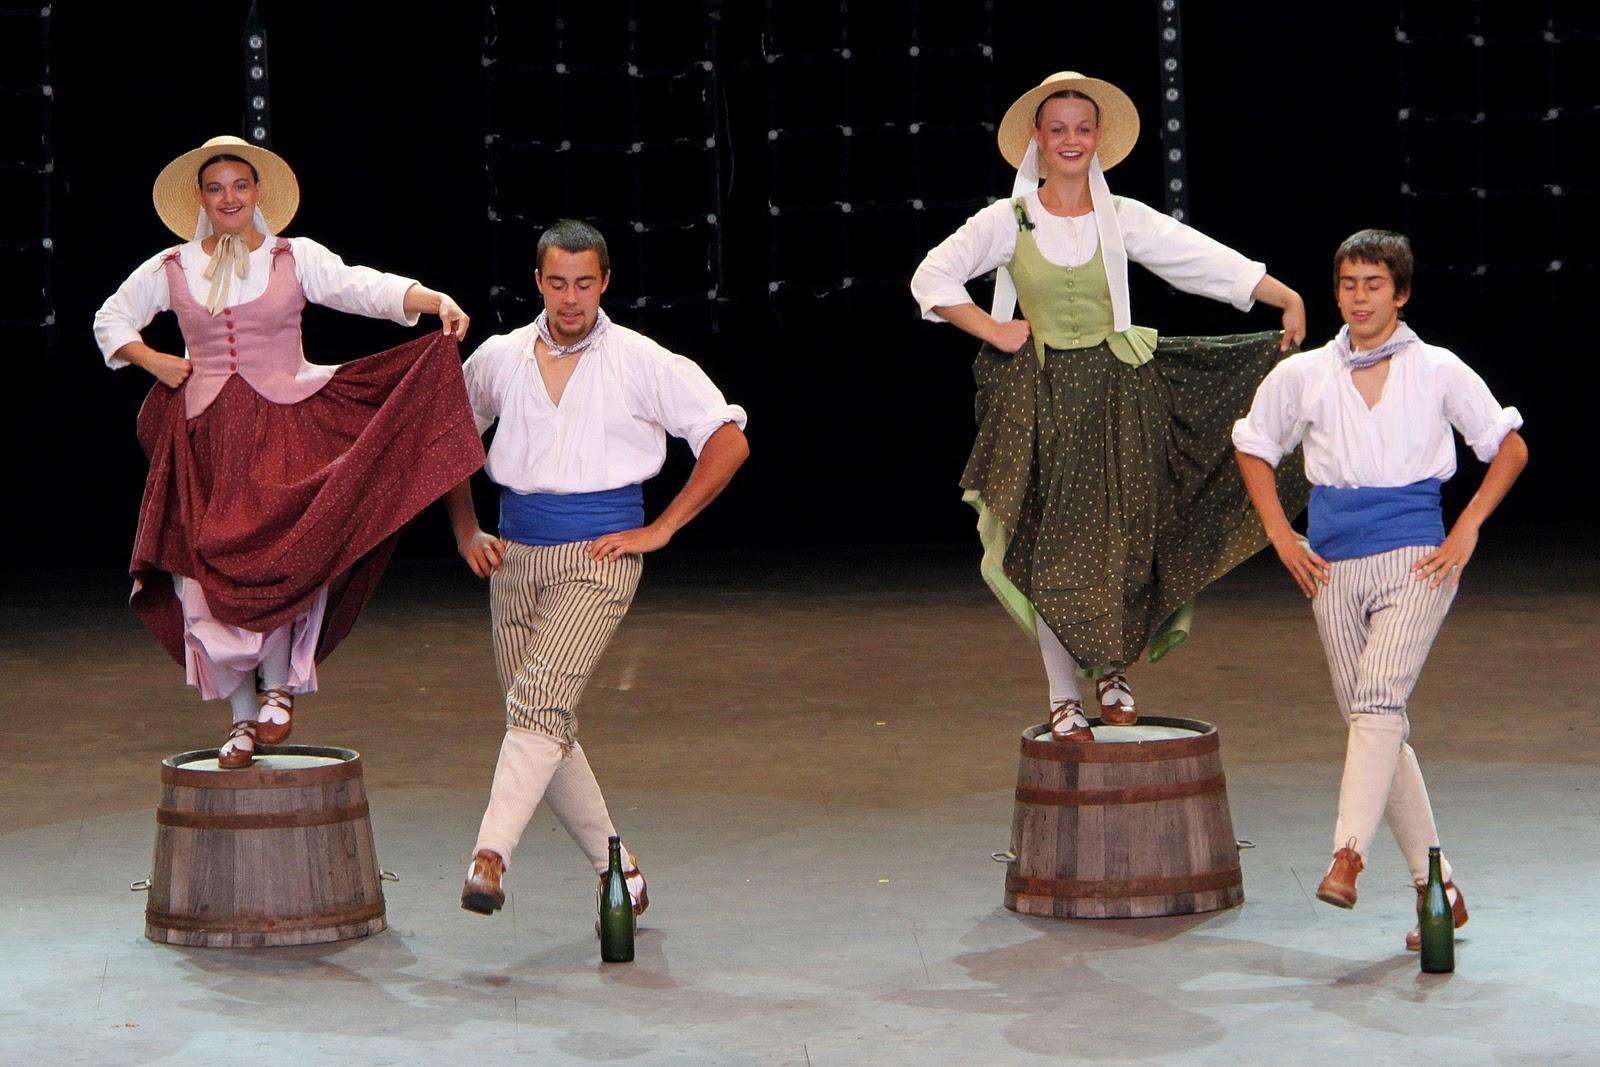 Cultura mejillones ballet folkl rico de francia en mejillones for Entrantes tipicos franceses